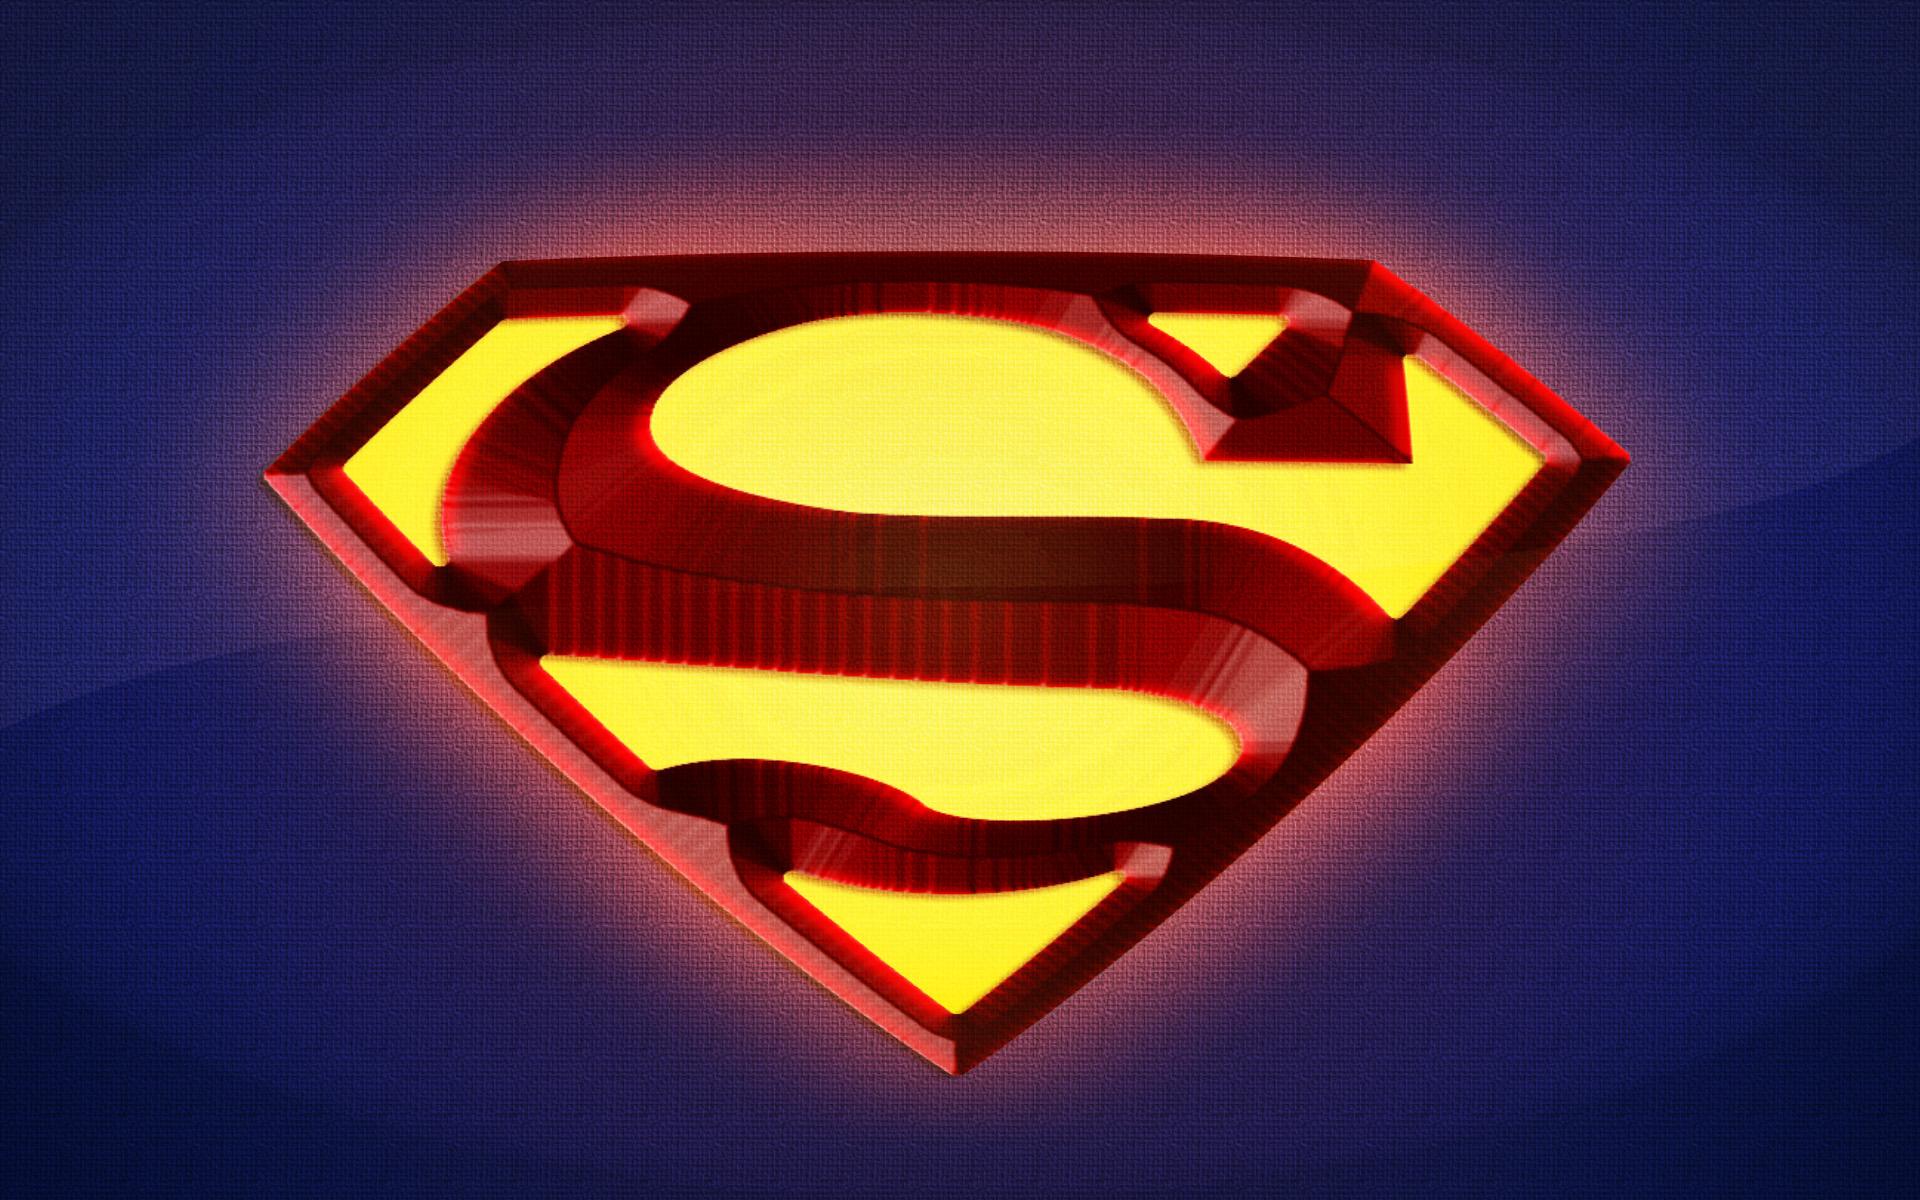 Superman shield wallpaper   886984 1920x1200